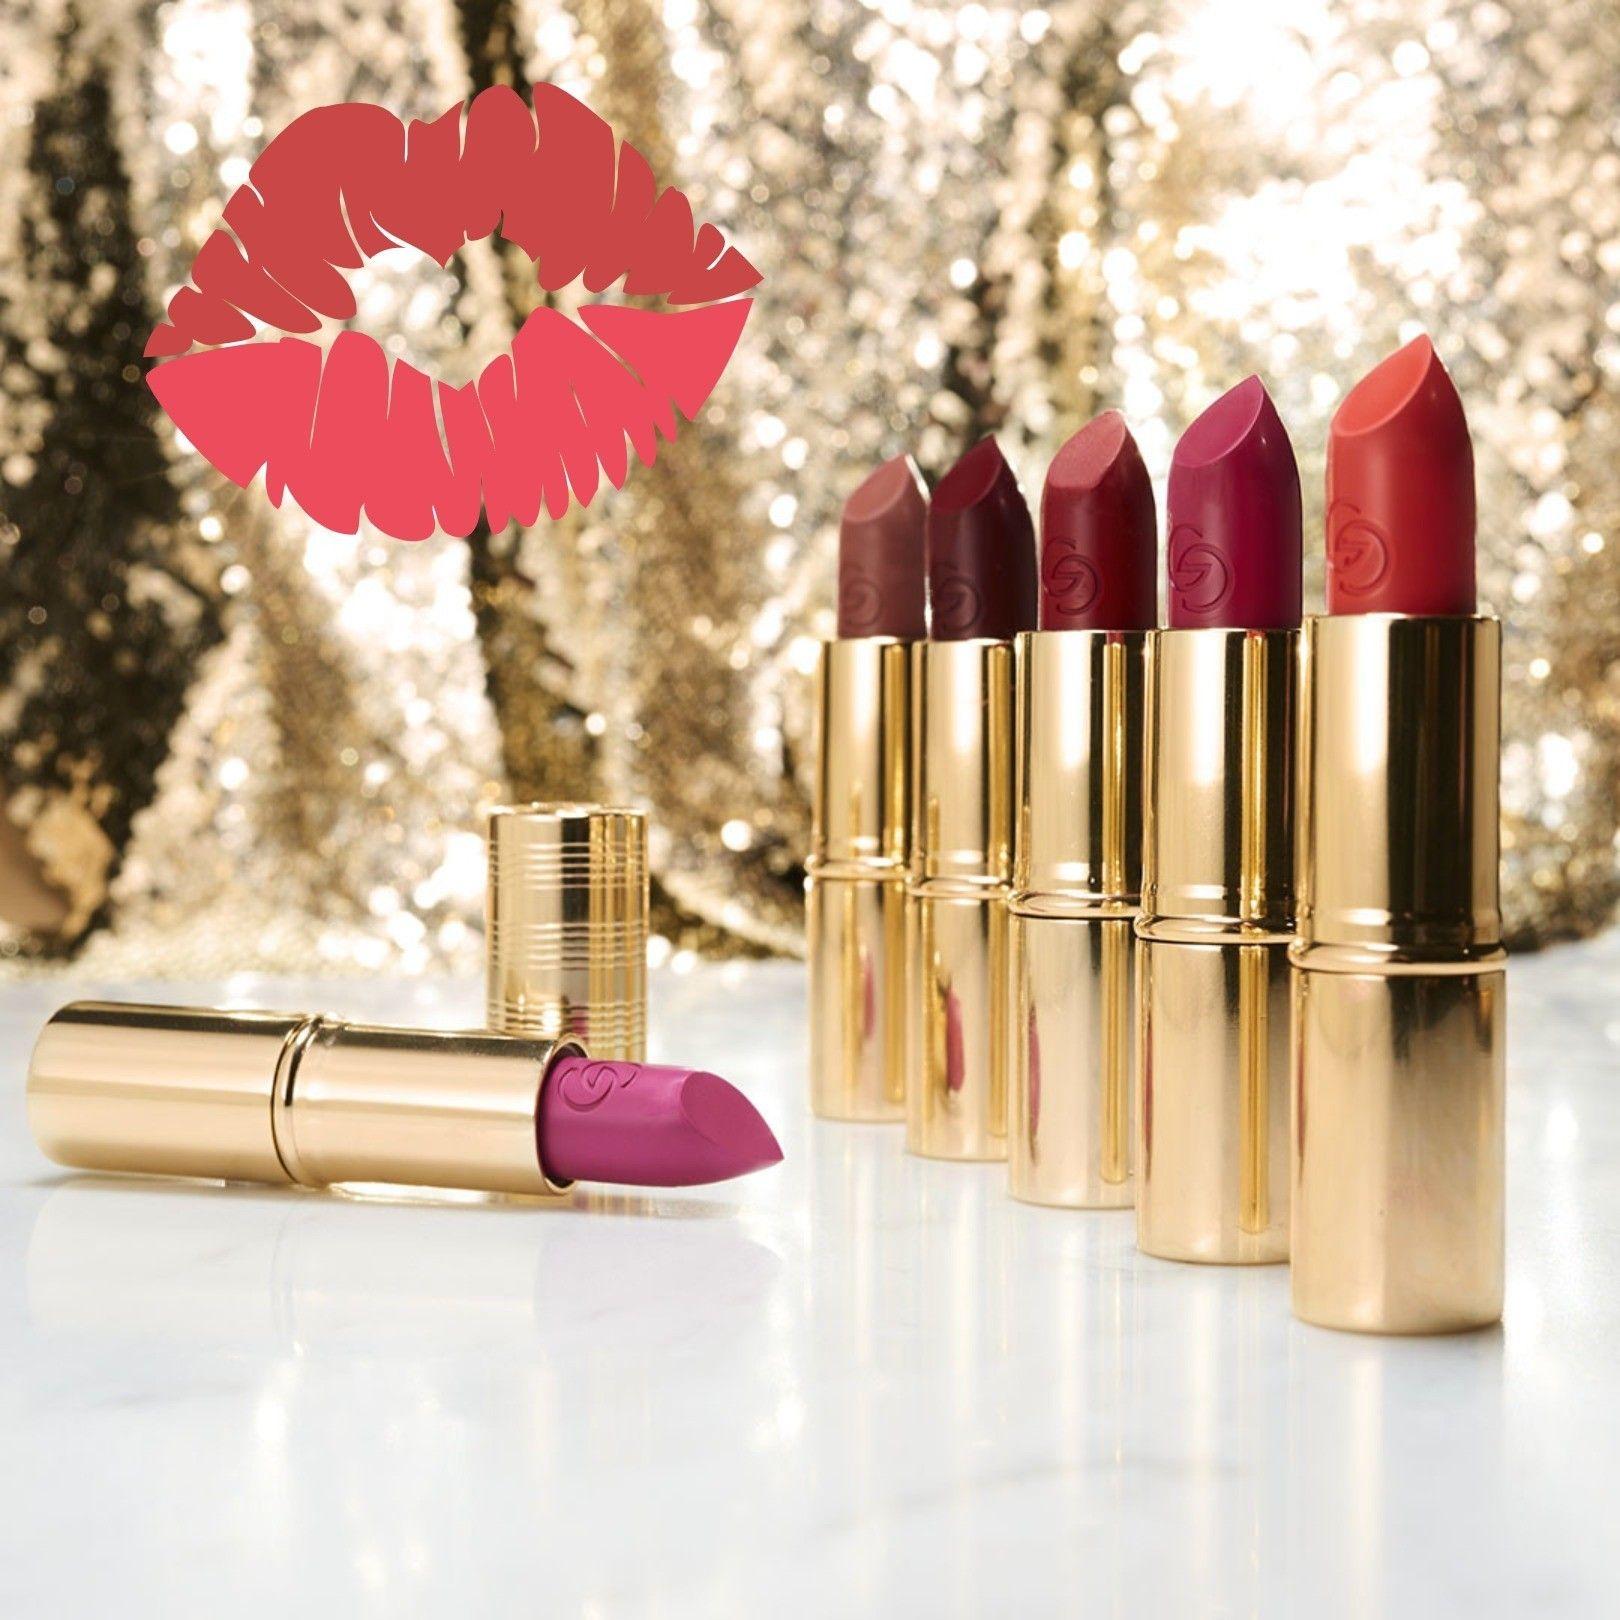 The Iconic Metallic Matte Lipstick leaves a creamy matte